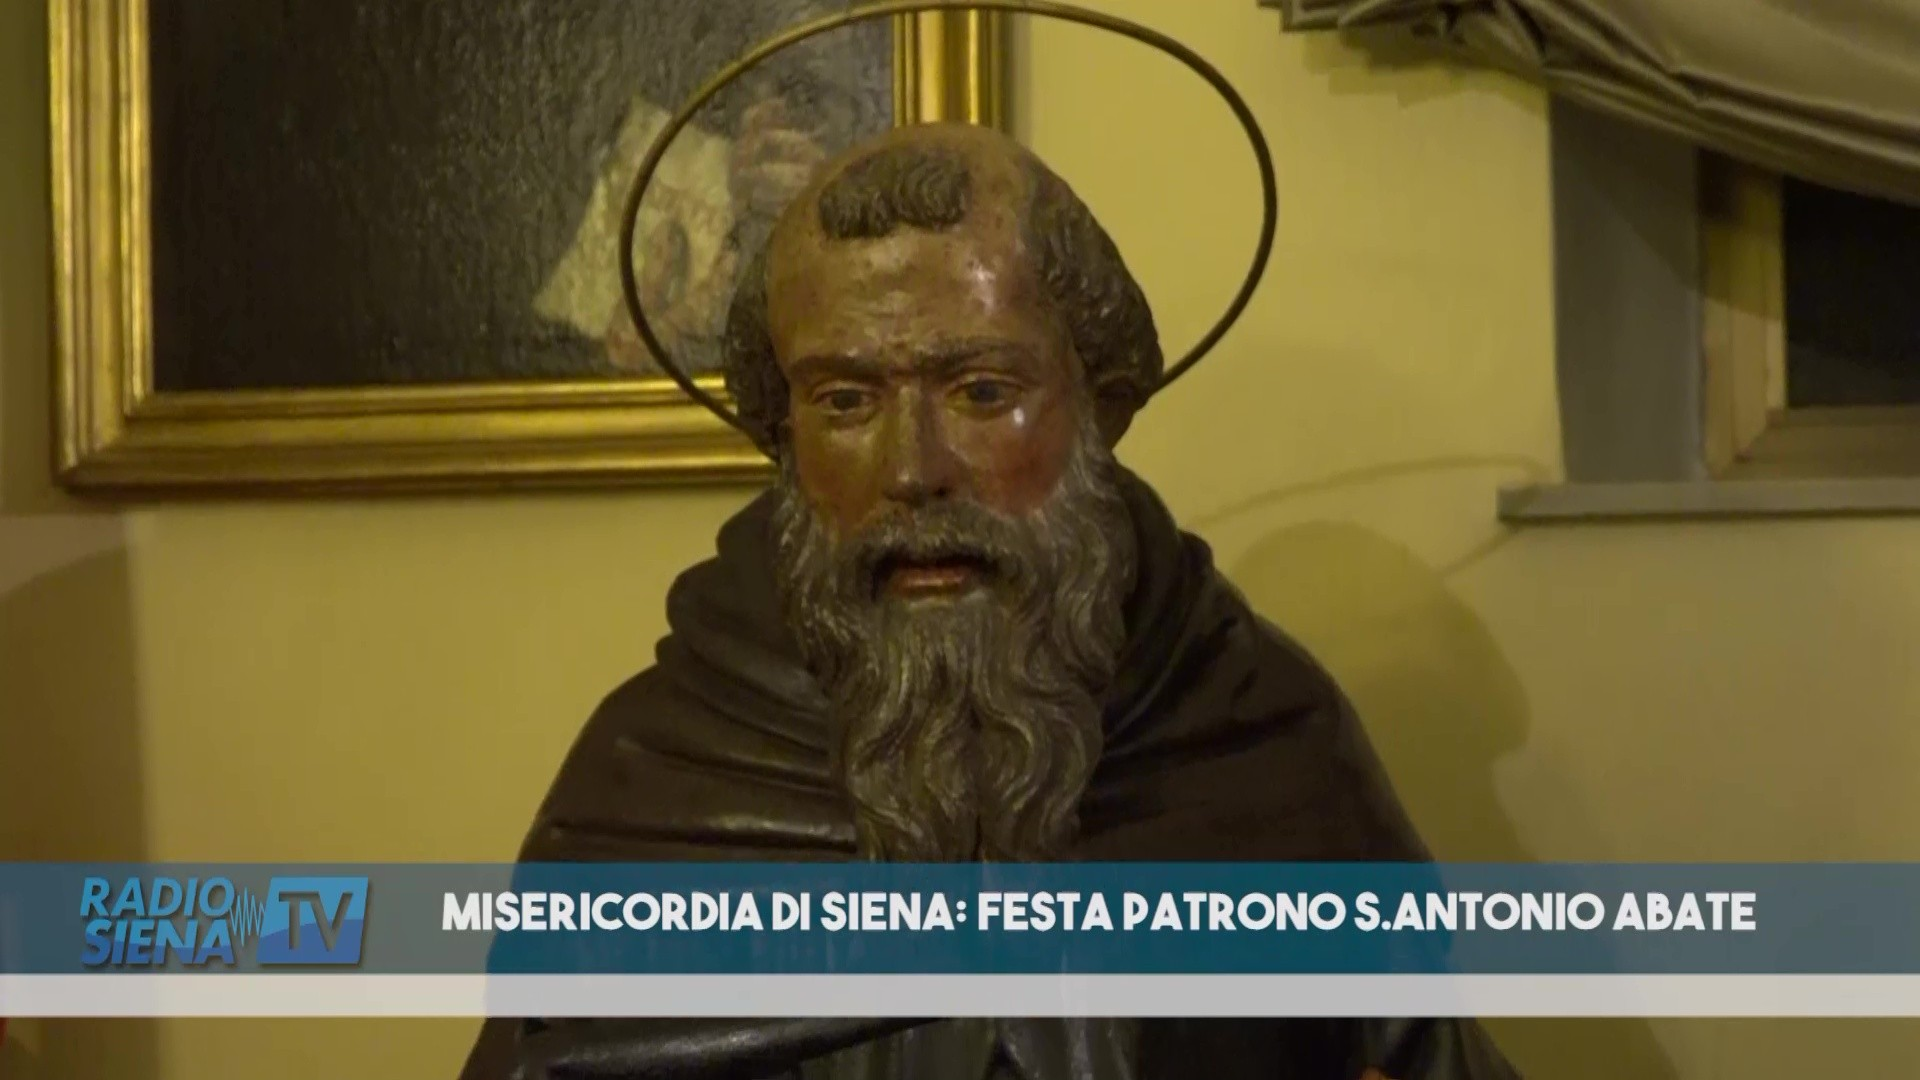 MISERICORDIA DI SIENA: FESTA PATRONO S.ANTONIO ABATE